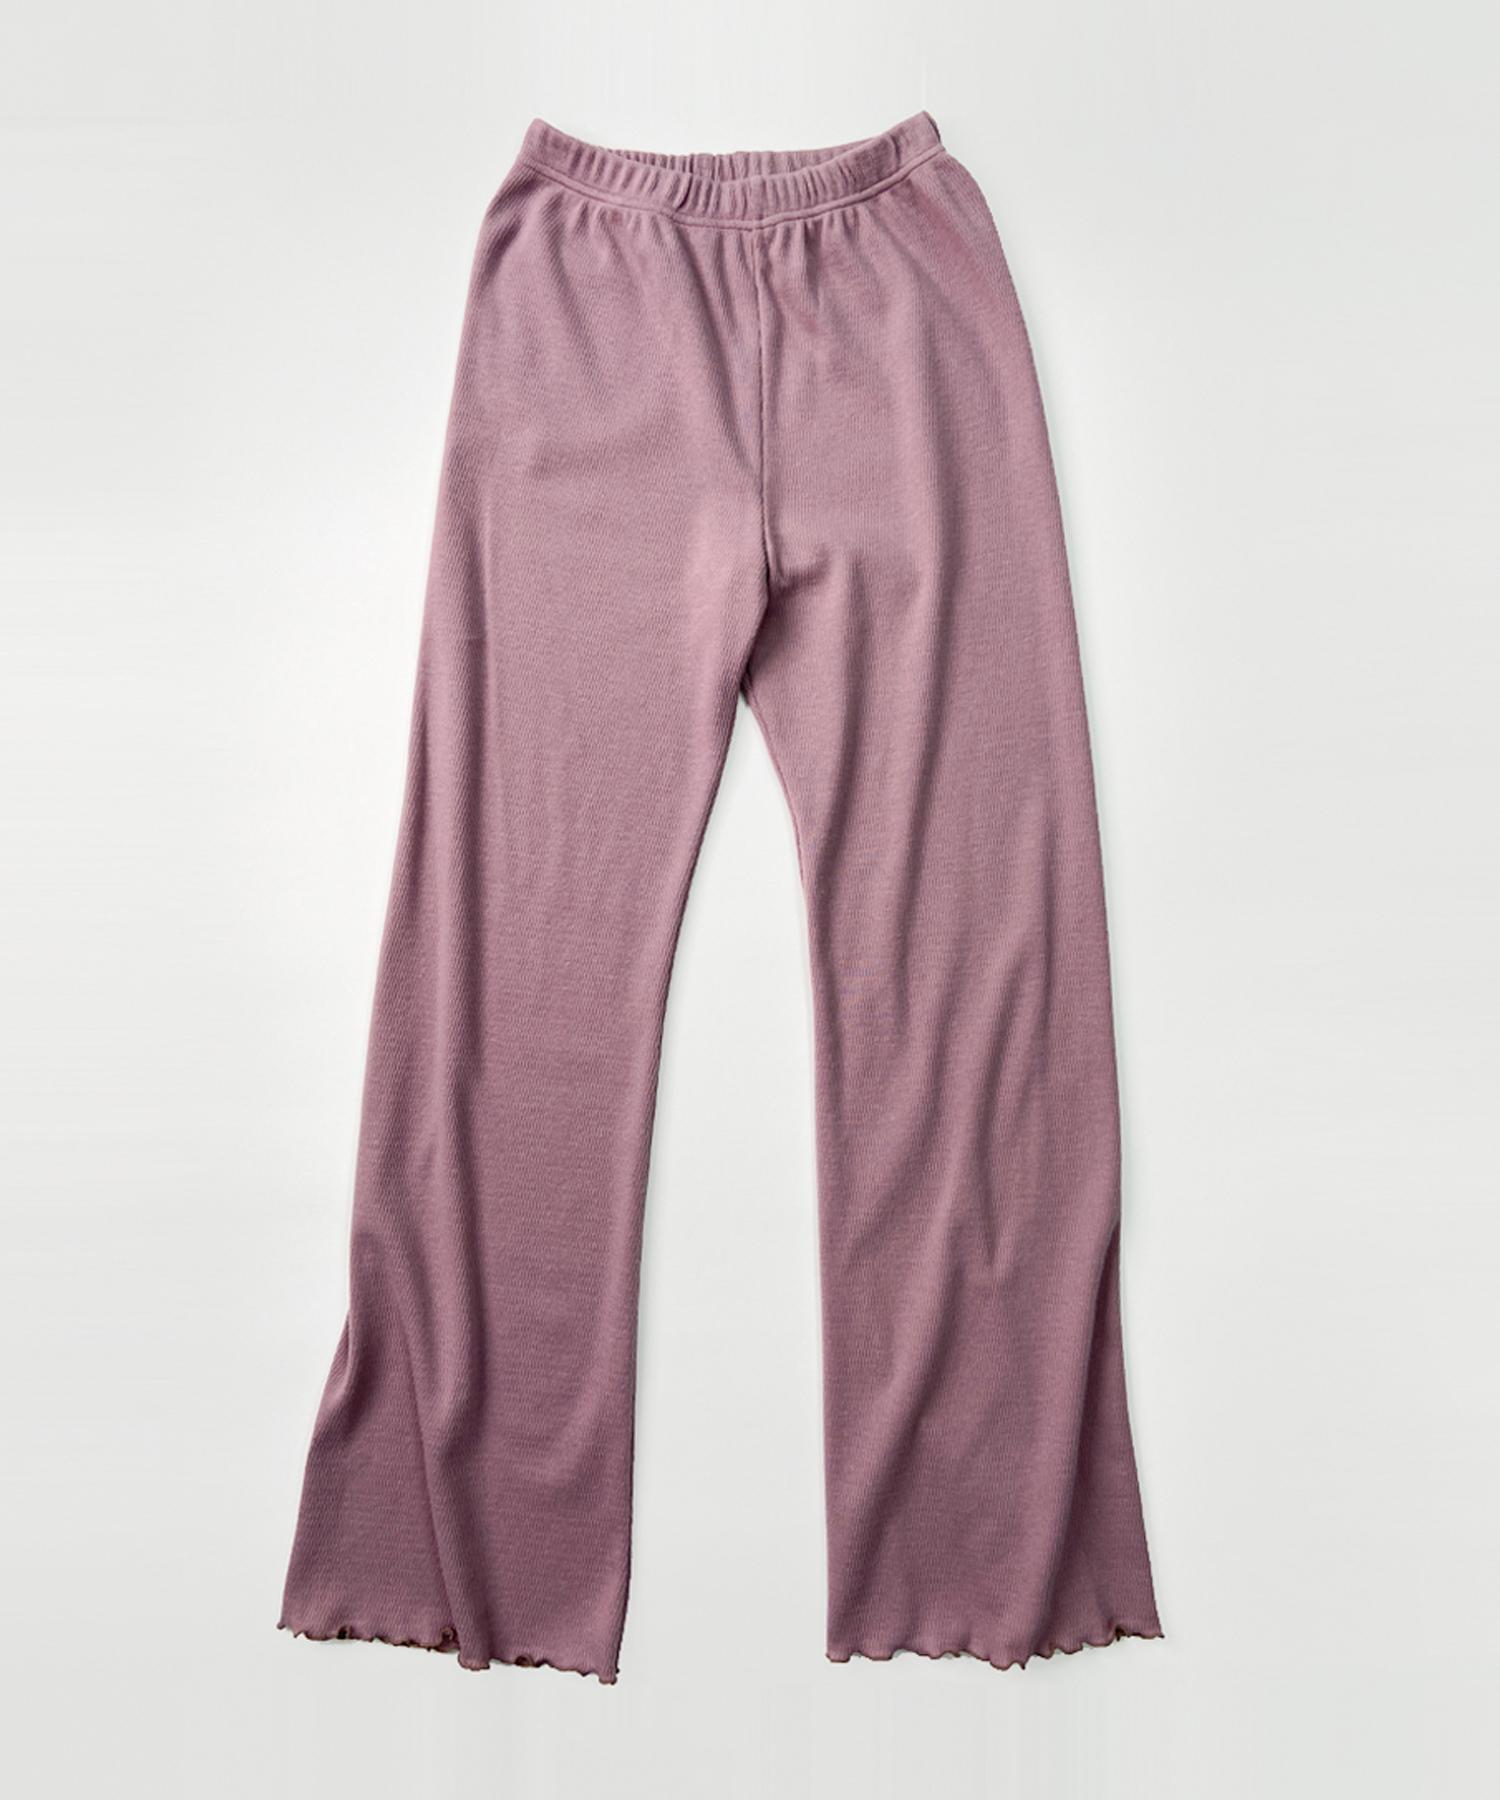 PARMA BOOTS CUT PANTS (파르마 부츠컷 팬츠) - PINK